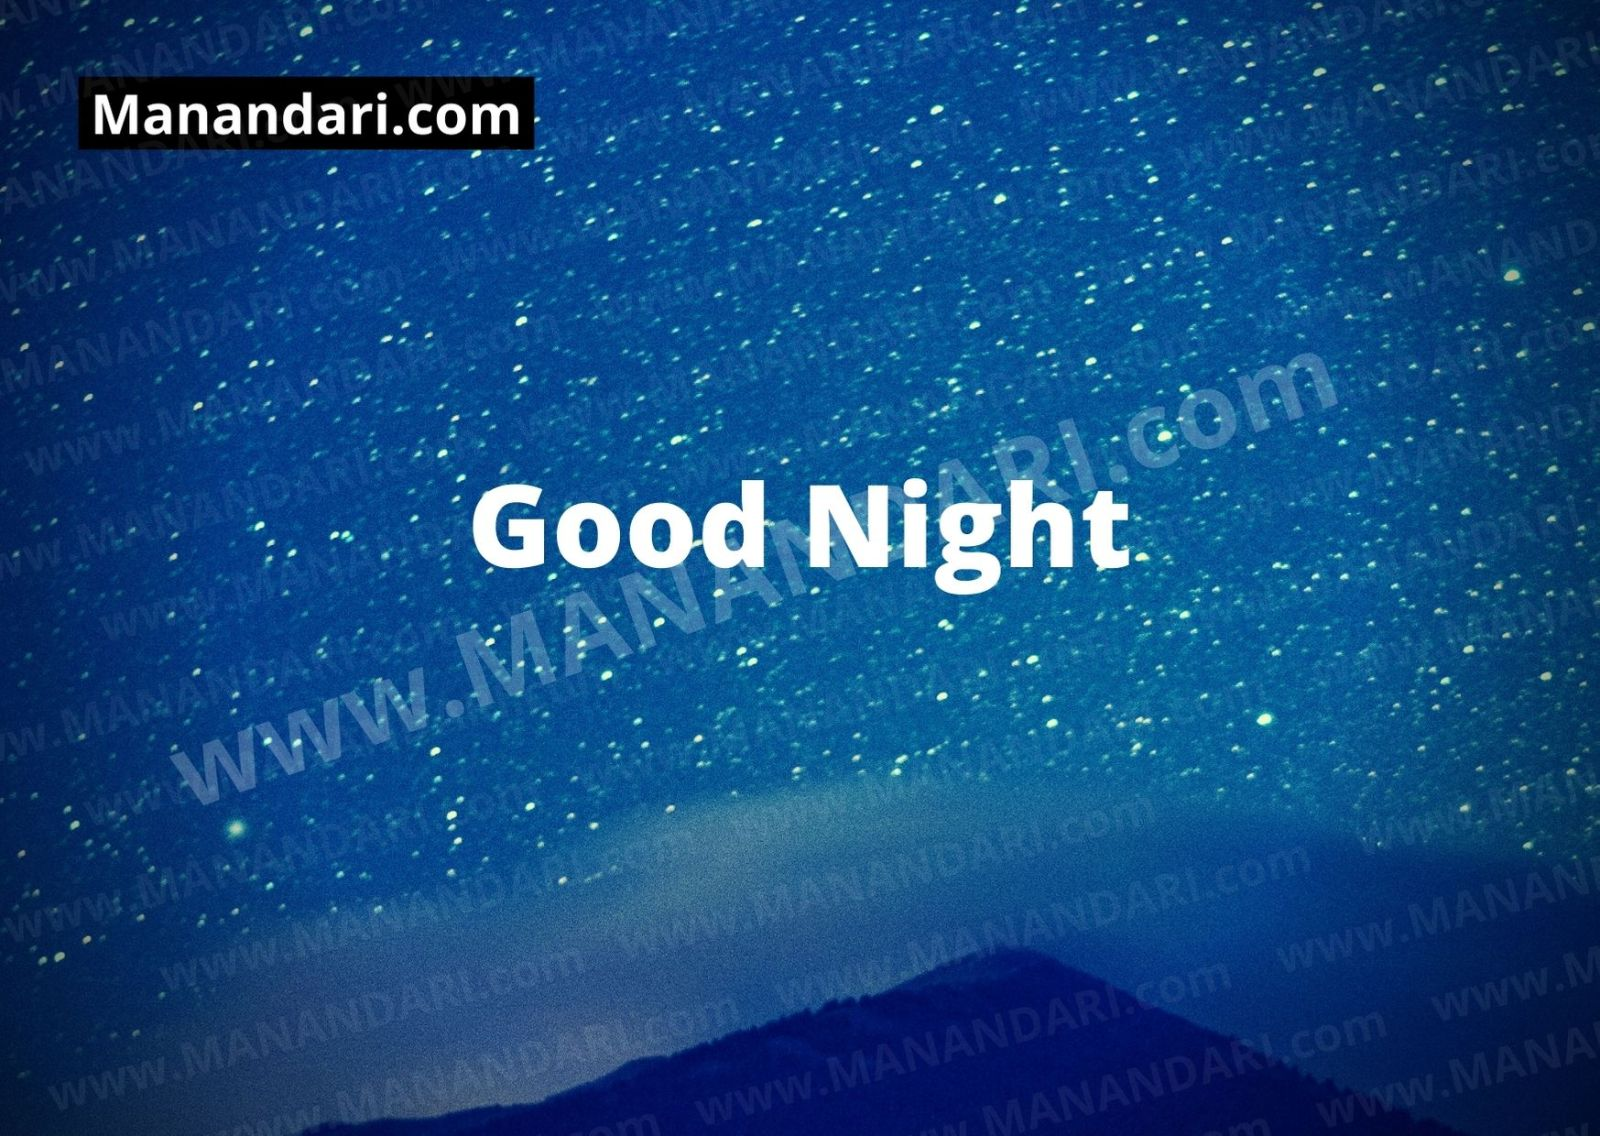 Good Night - 18